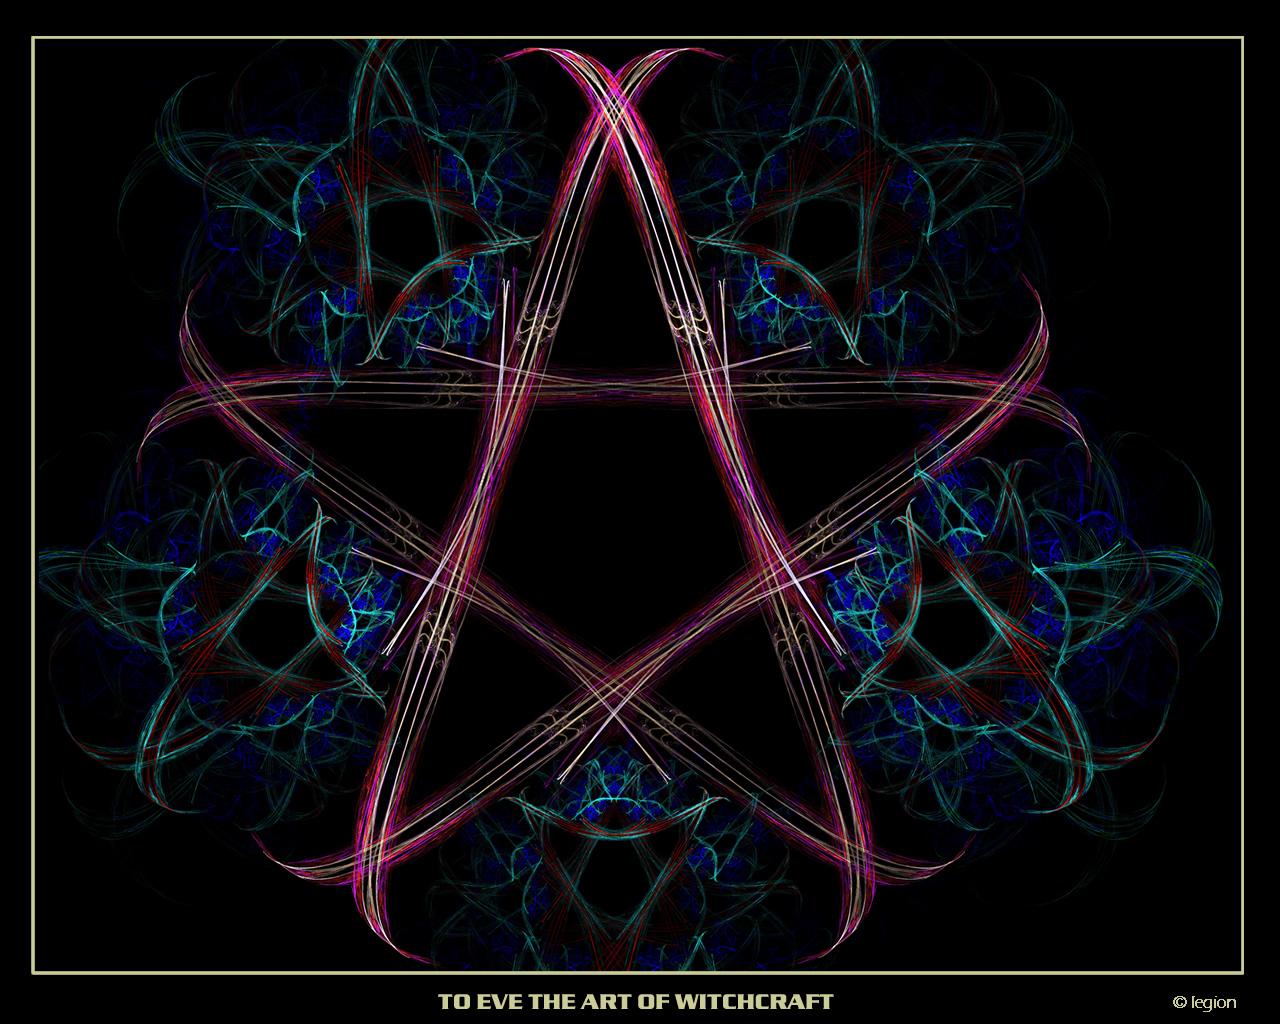 http://2.bp.blogspot.com/-dxO6kxVJWRI/T3LqZ5gG3fI/AAAAAAAAB9U/uaa1iWD_2mw/s1600/To_Eve_the_Art_of_Witchcraft_by_markoflegion.jpg